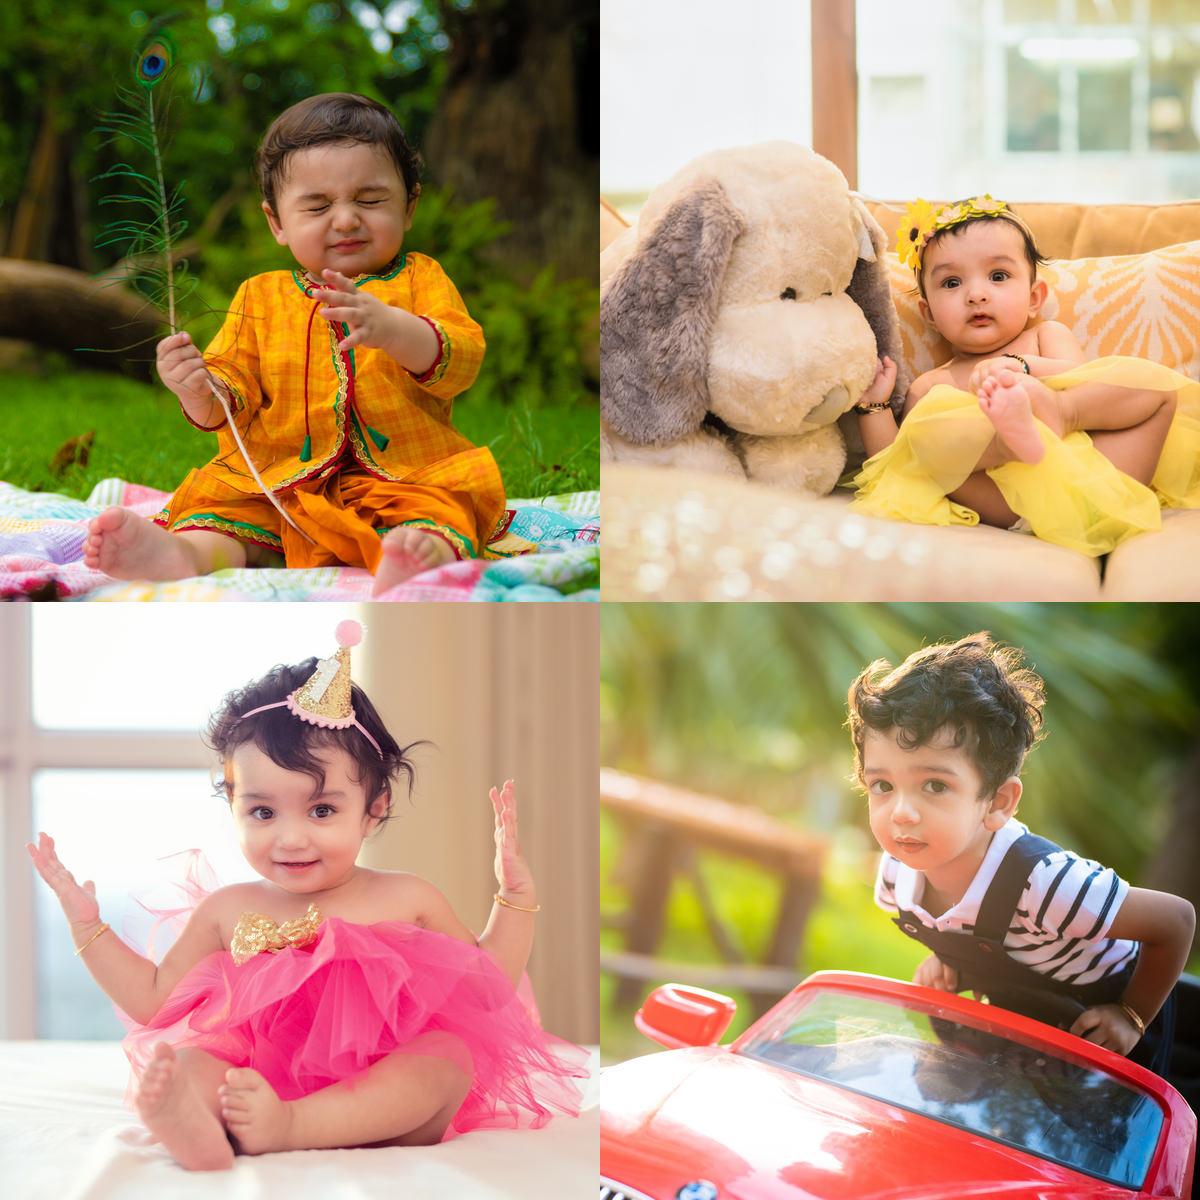 Children's Photography 1 ❤ NiddledyNoddledy.com ~ Bumps to Babies Photography, Kolkata.jpg